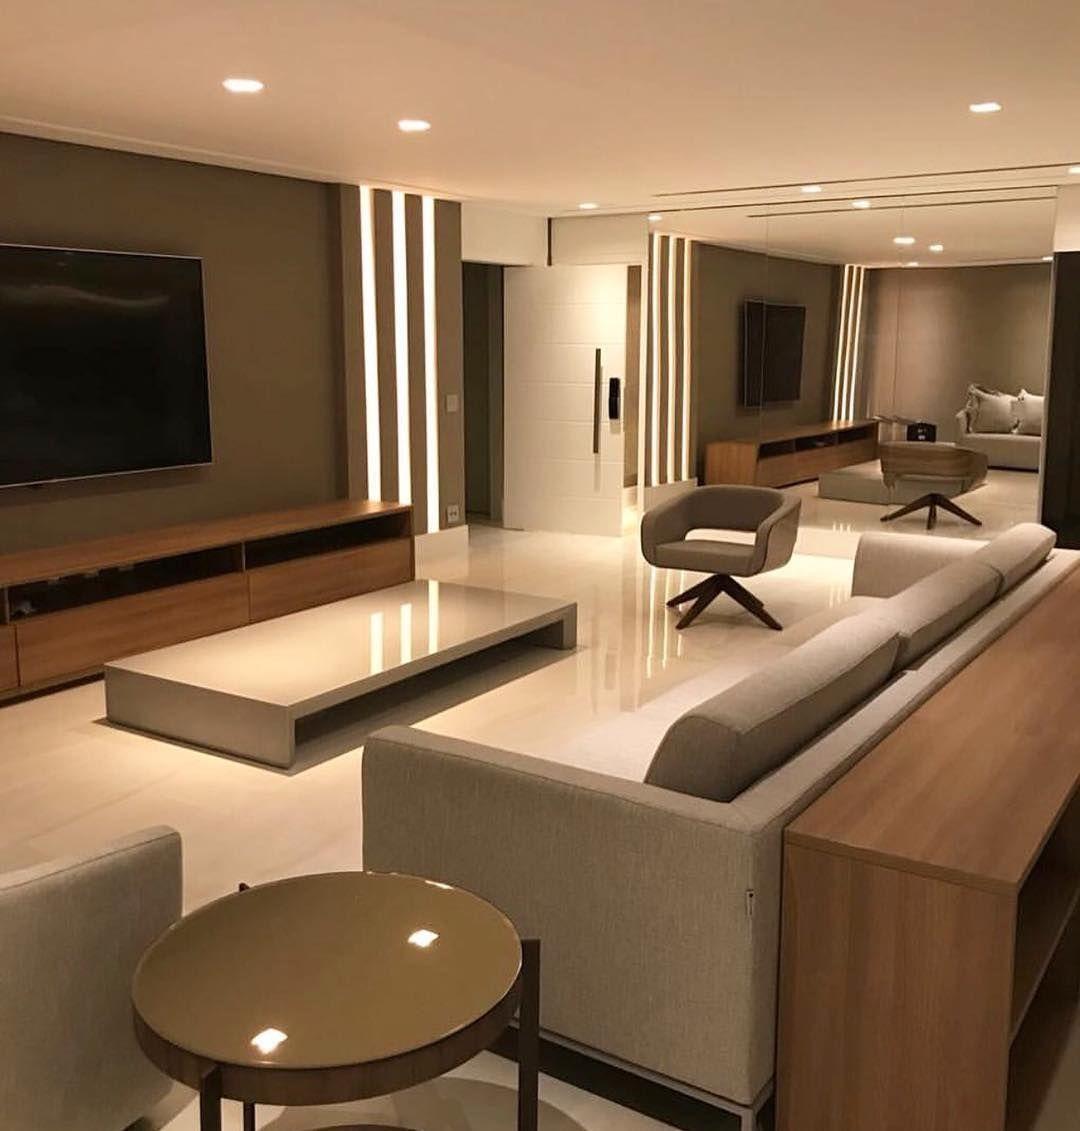 45 Captivating Living Room Ideas With Ceiling Light Design #modernlightingdesign